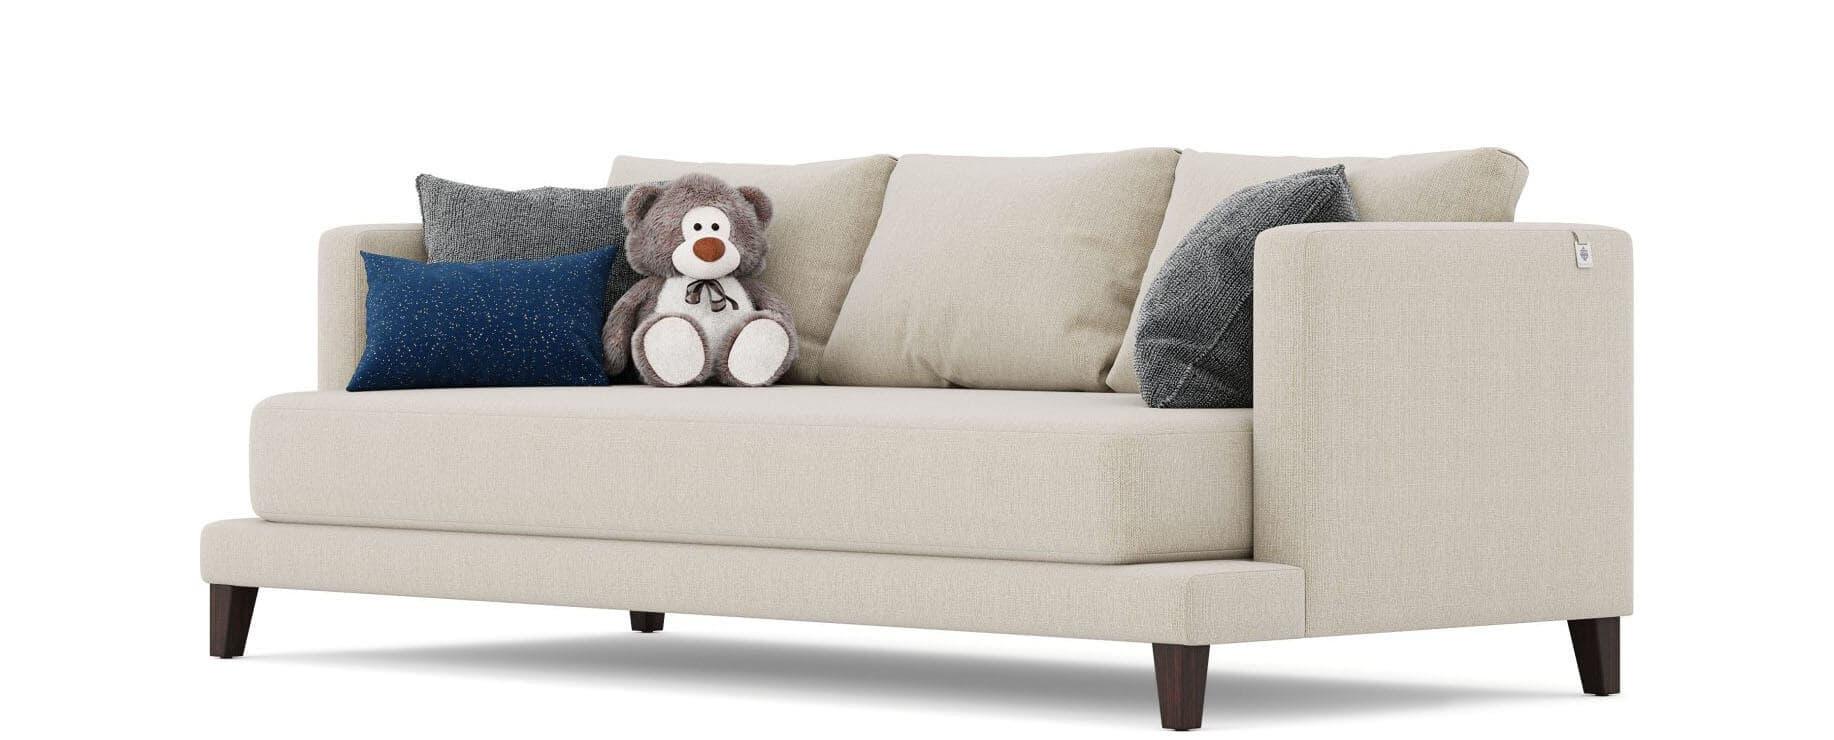 Picture of: Sofa Bed For Children Kd33 Plus Buy In Kiyv Ukraine From The Manufacturer Delavega